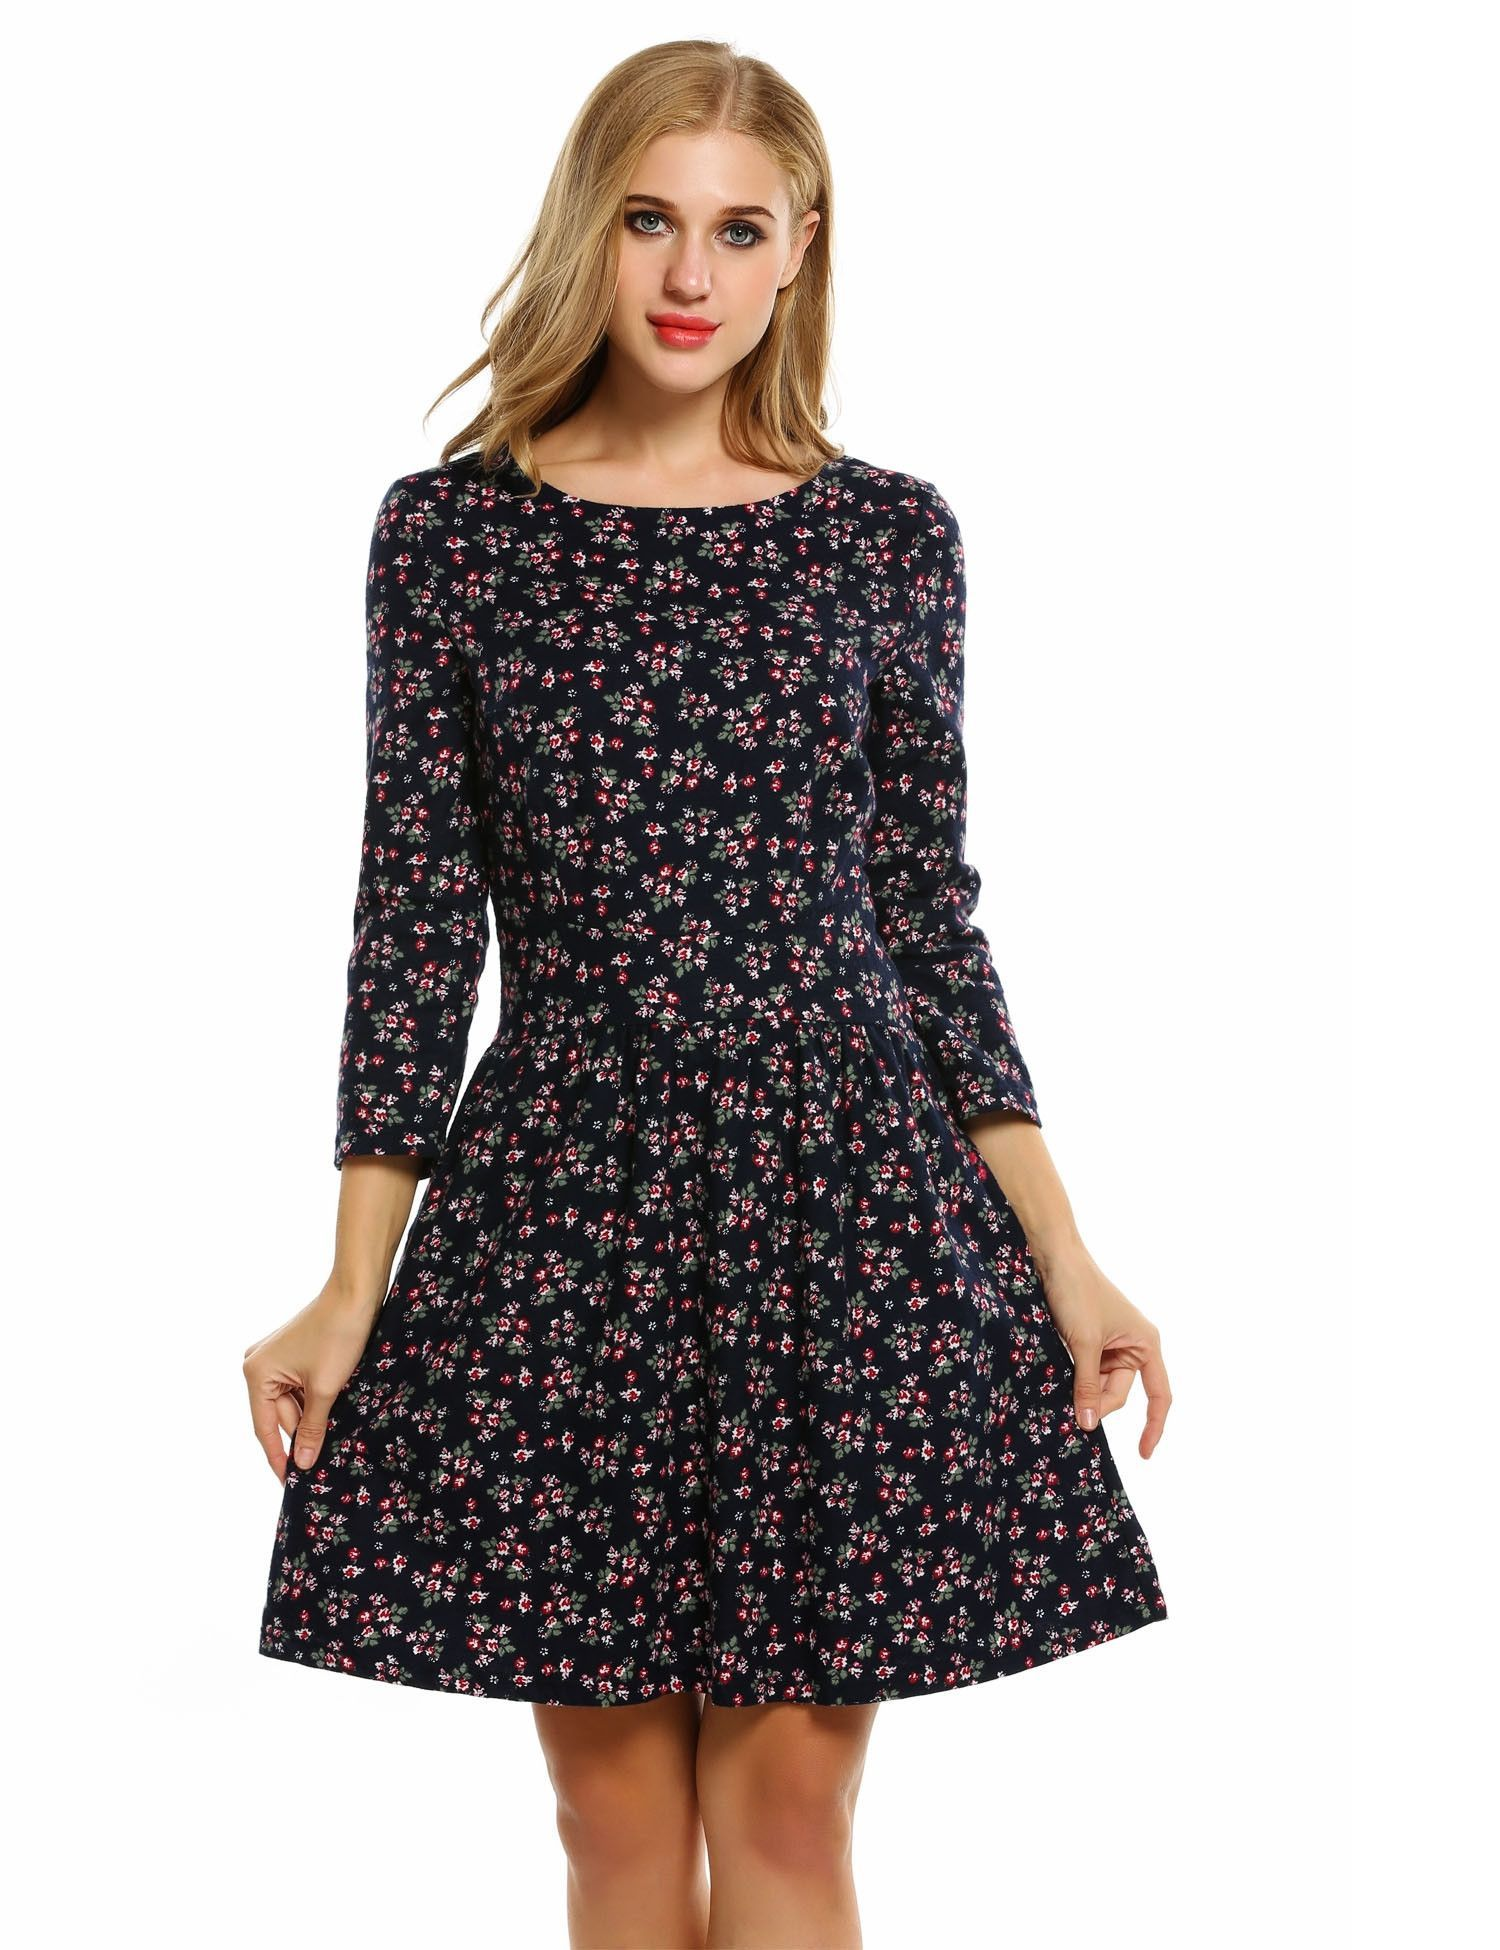 Women Fashion Long Sleeve Floral A Line Short Casual Dresses [ 1950 x 1500 Pixel ]